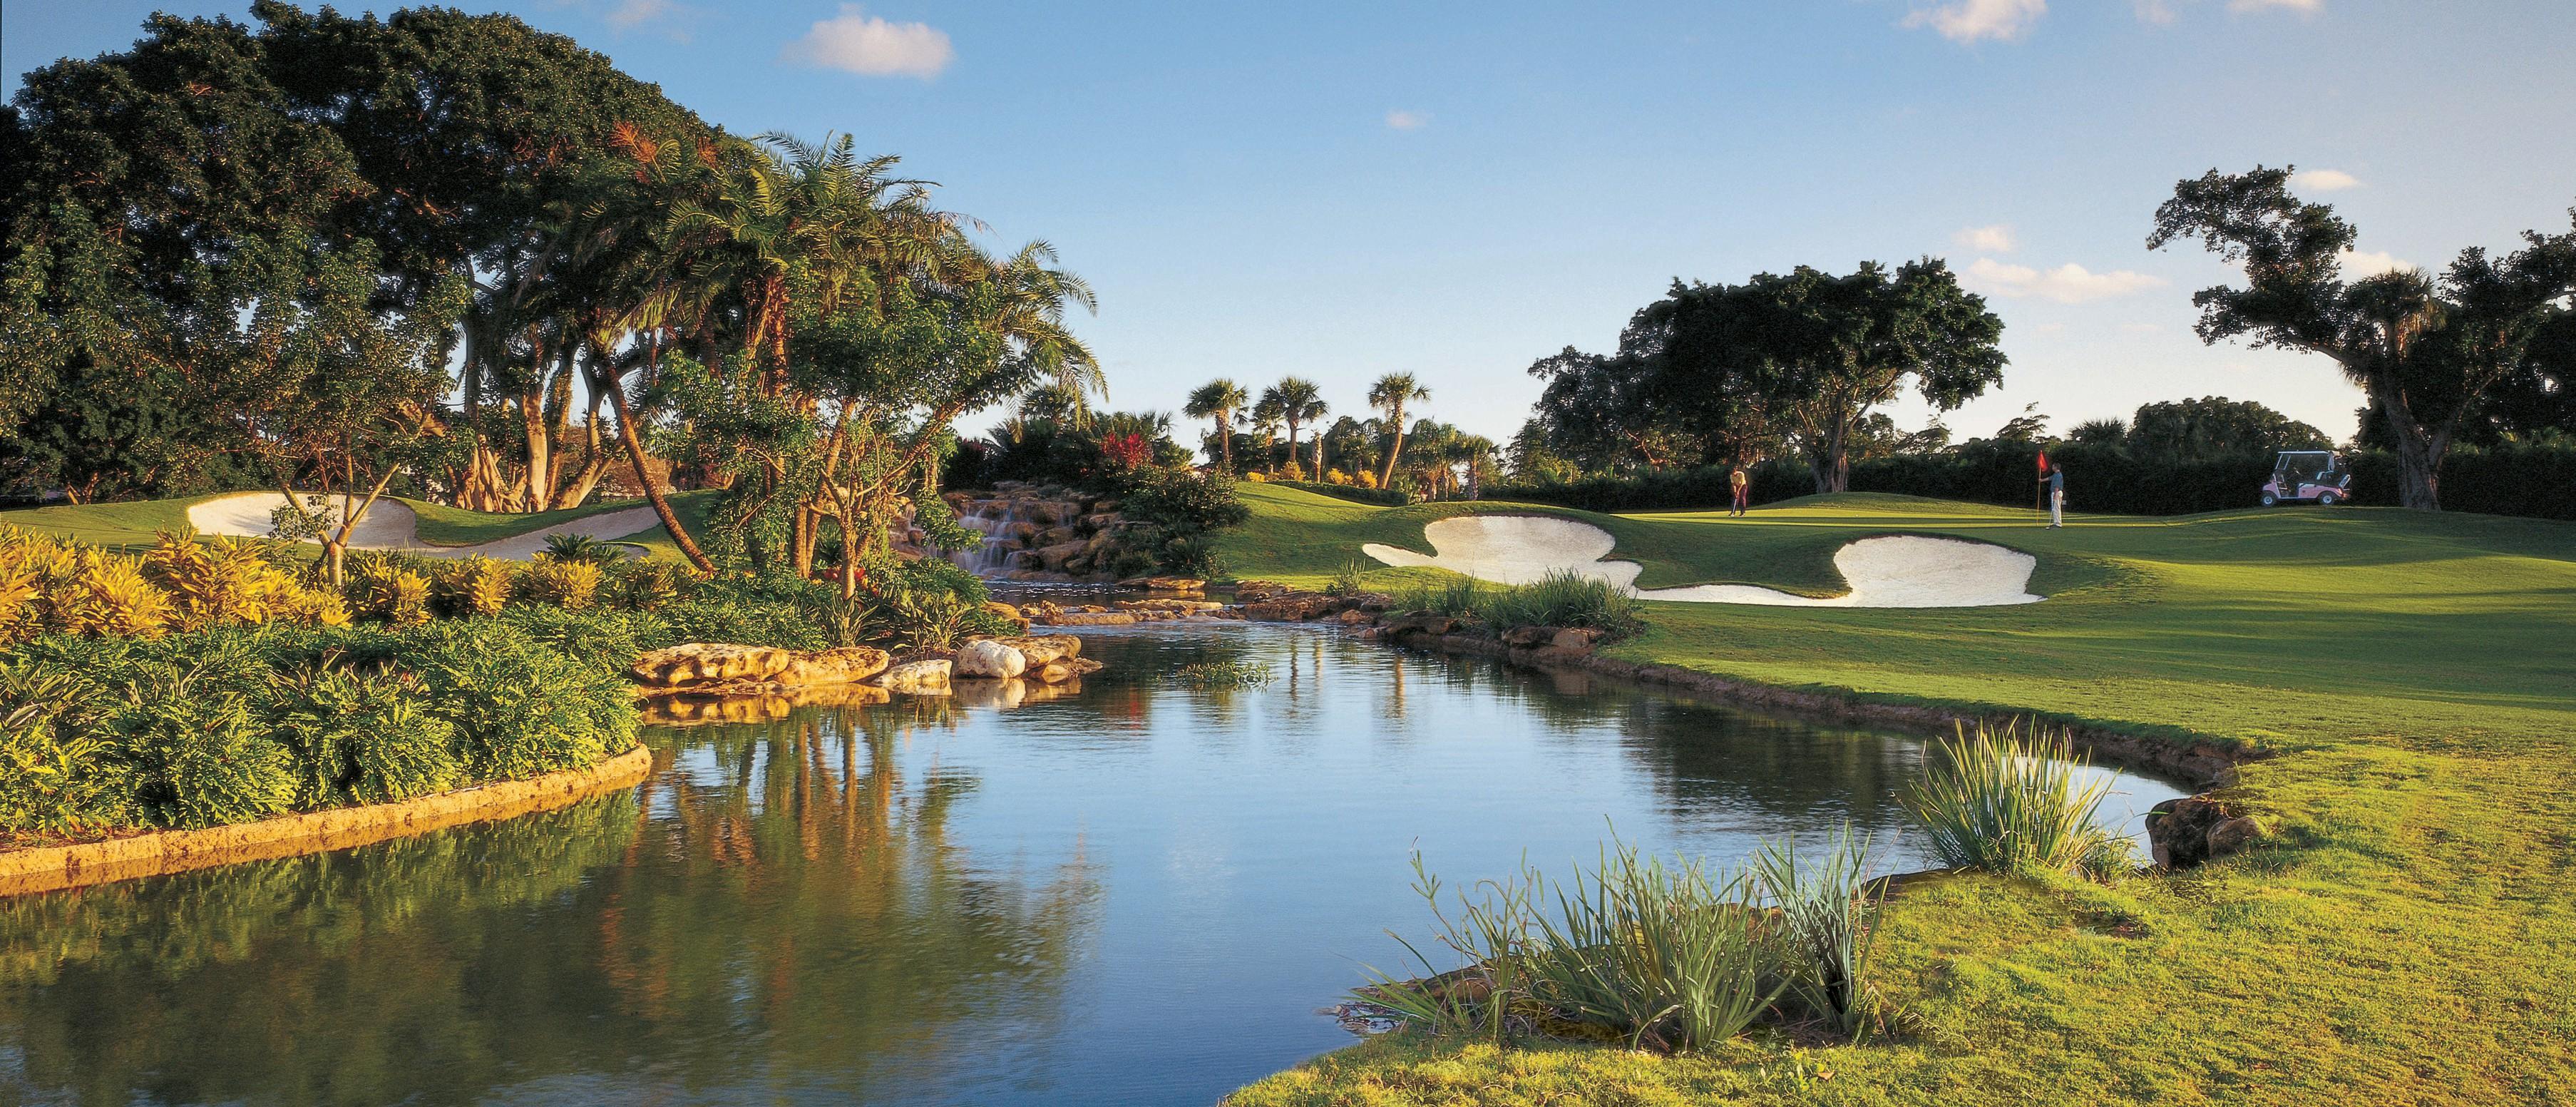 The Boca Raton Resort U0026 Club Has Two 18 Hole, Par 72 Golf Courses